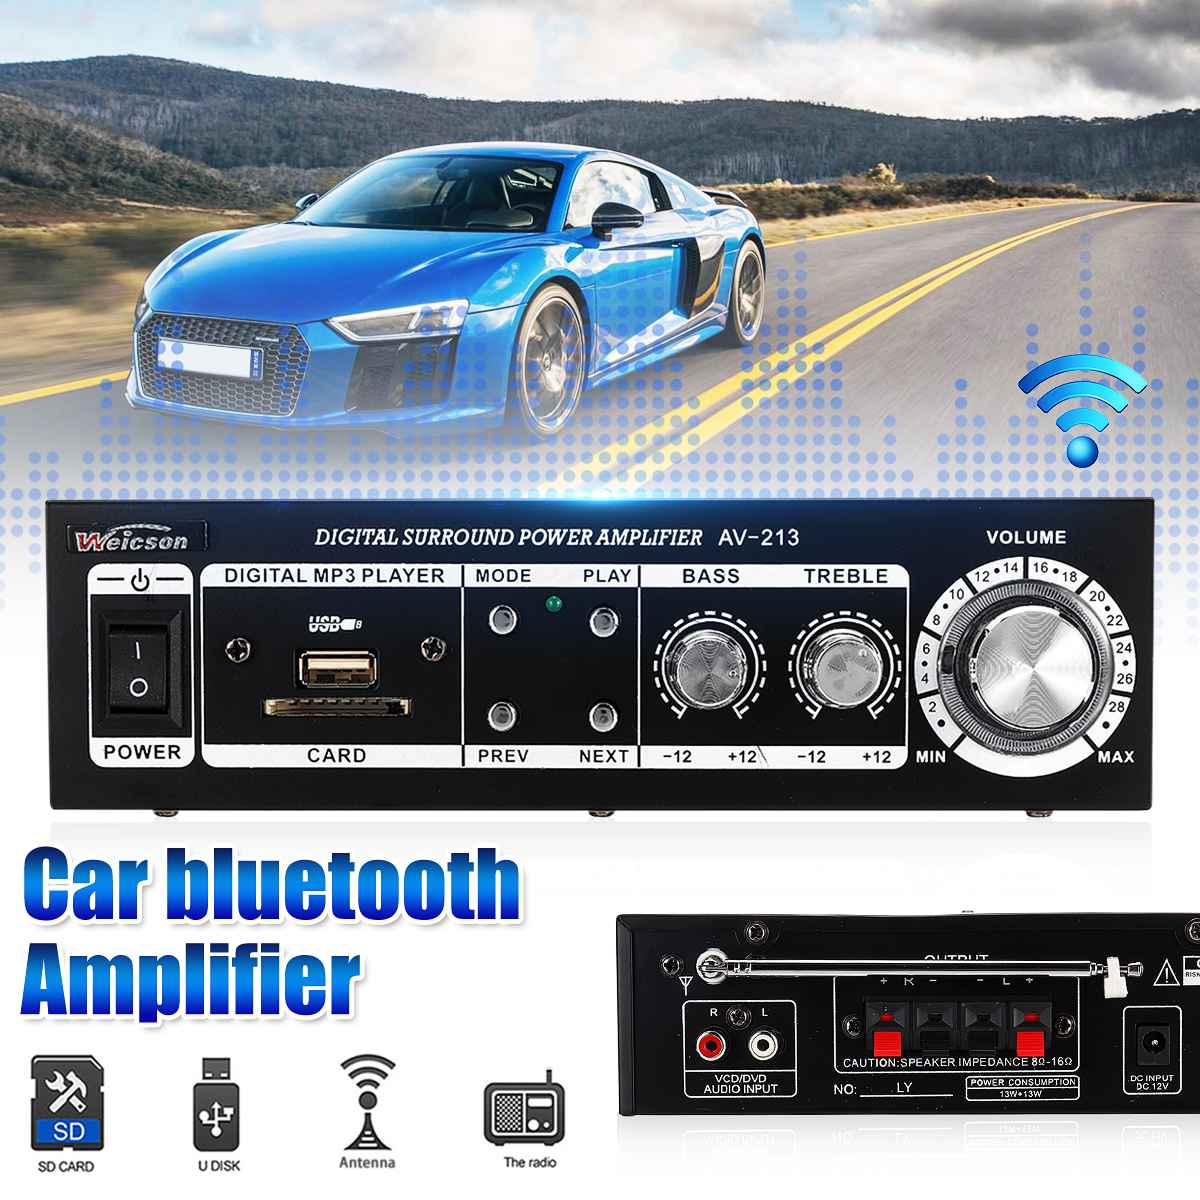 Amplifier-Board Bluetooth Audio-Amp Hifi Home Theater for Car U-Disk Fm-Radio